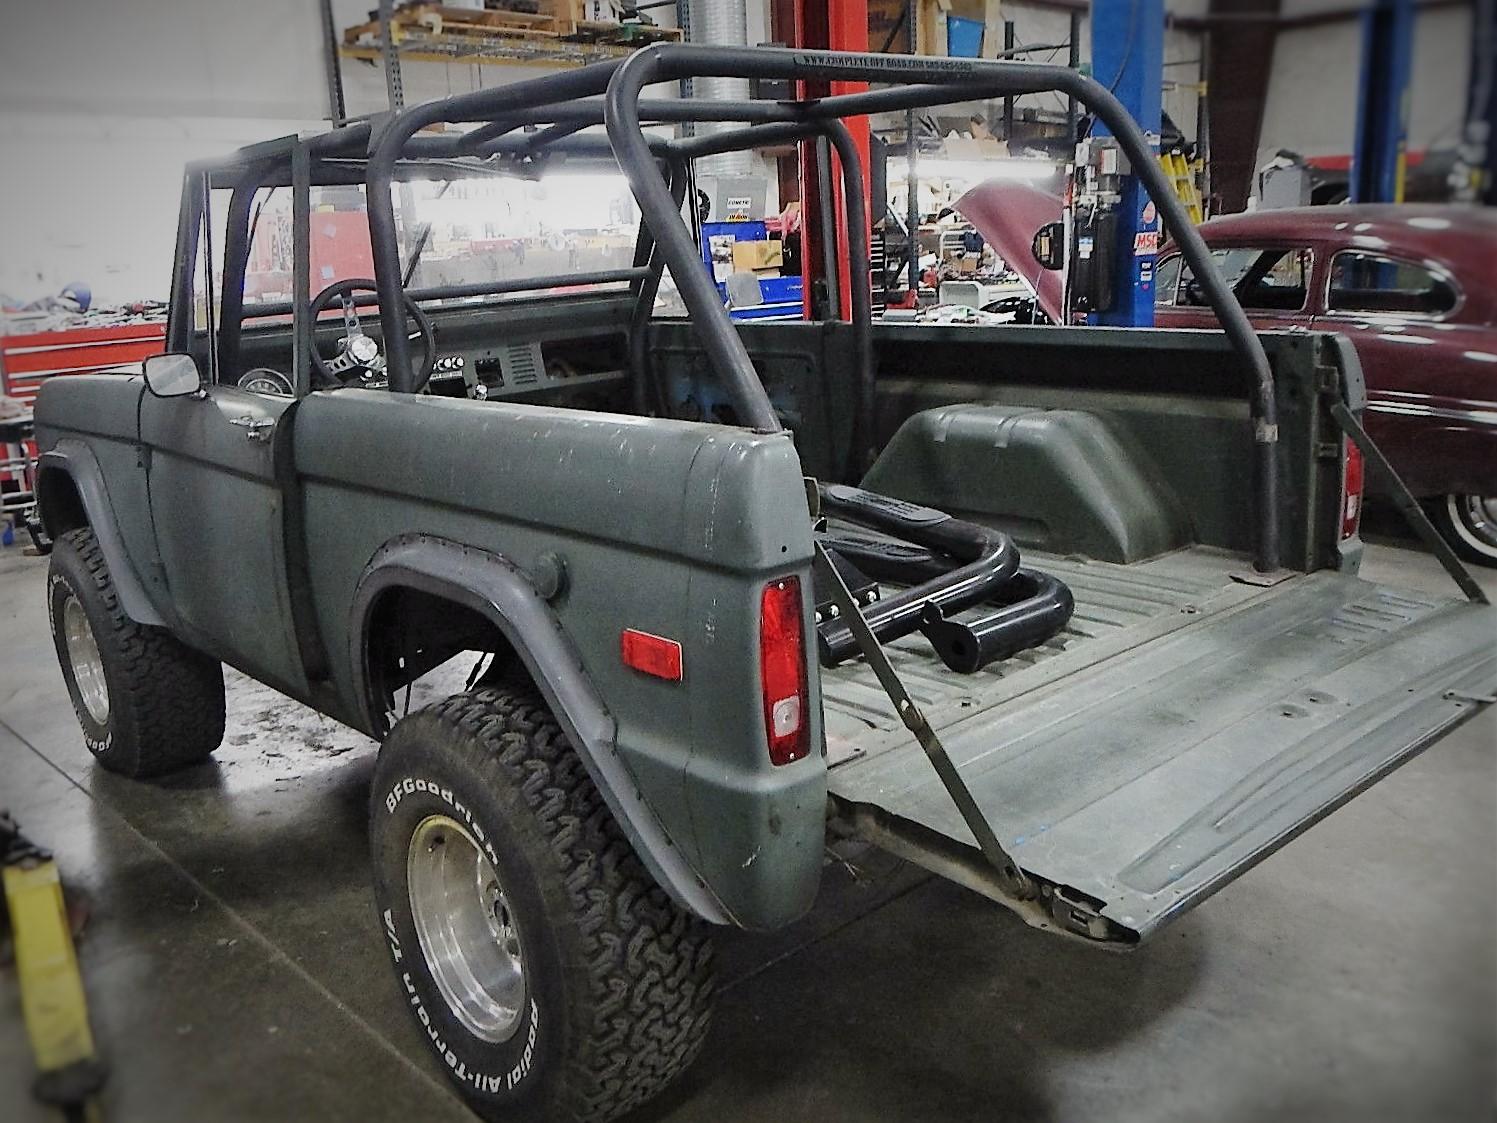 1974 Ford Bronco Restoration